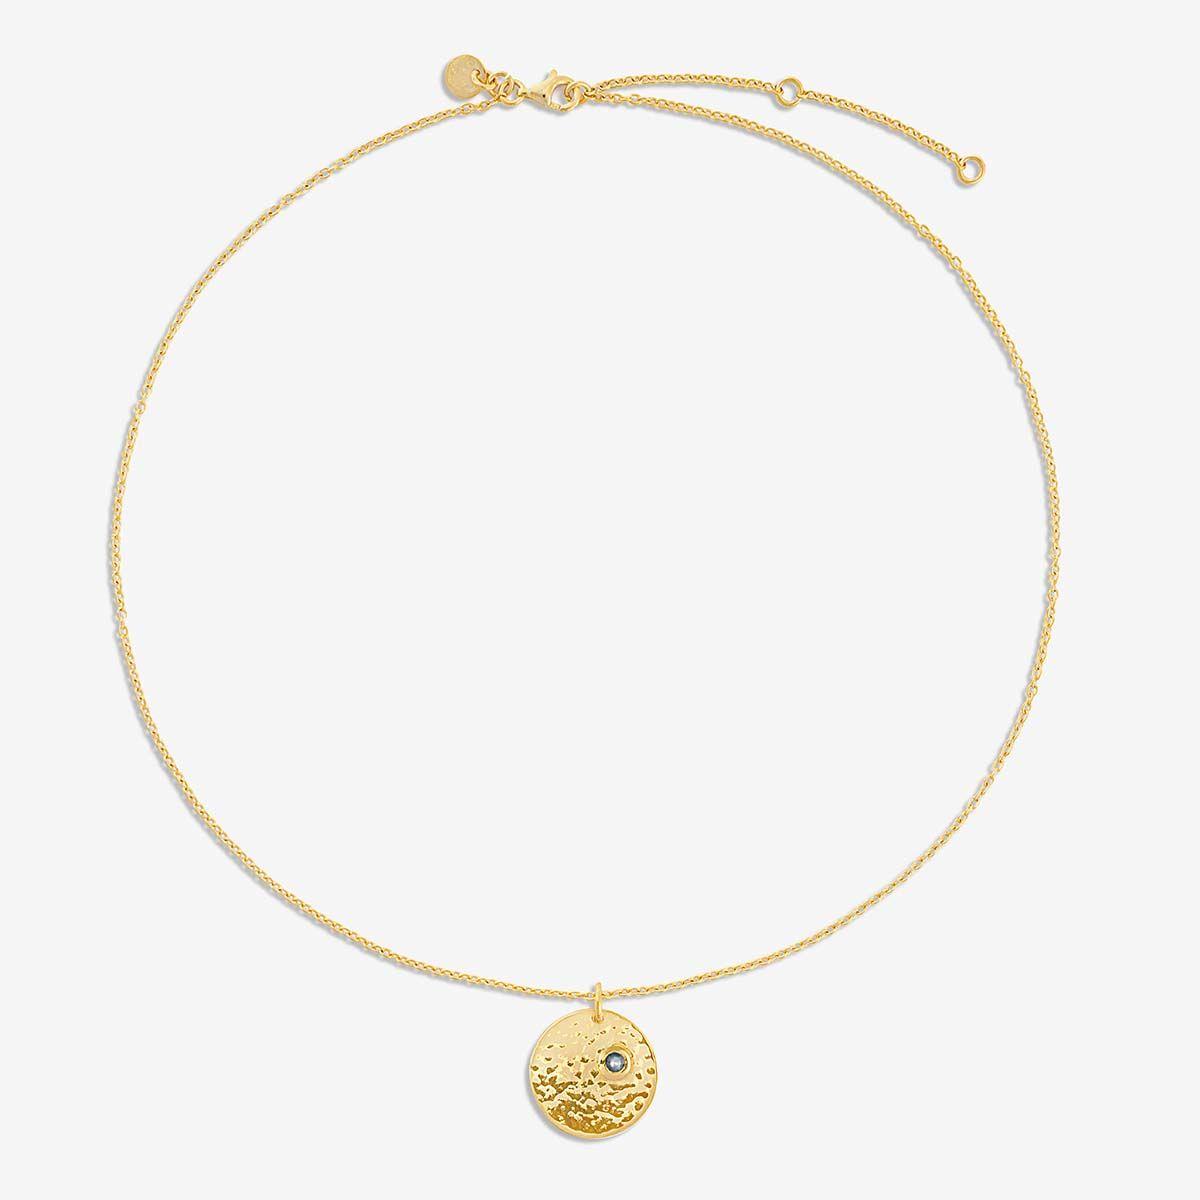 Birthstone September - Halsketten - Gold